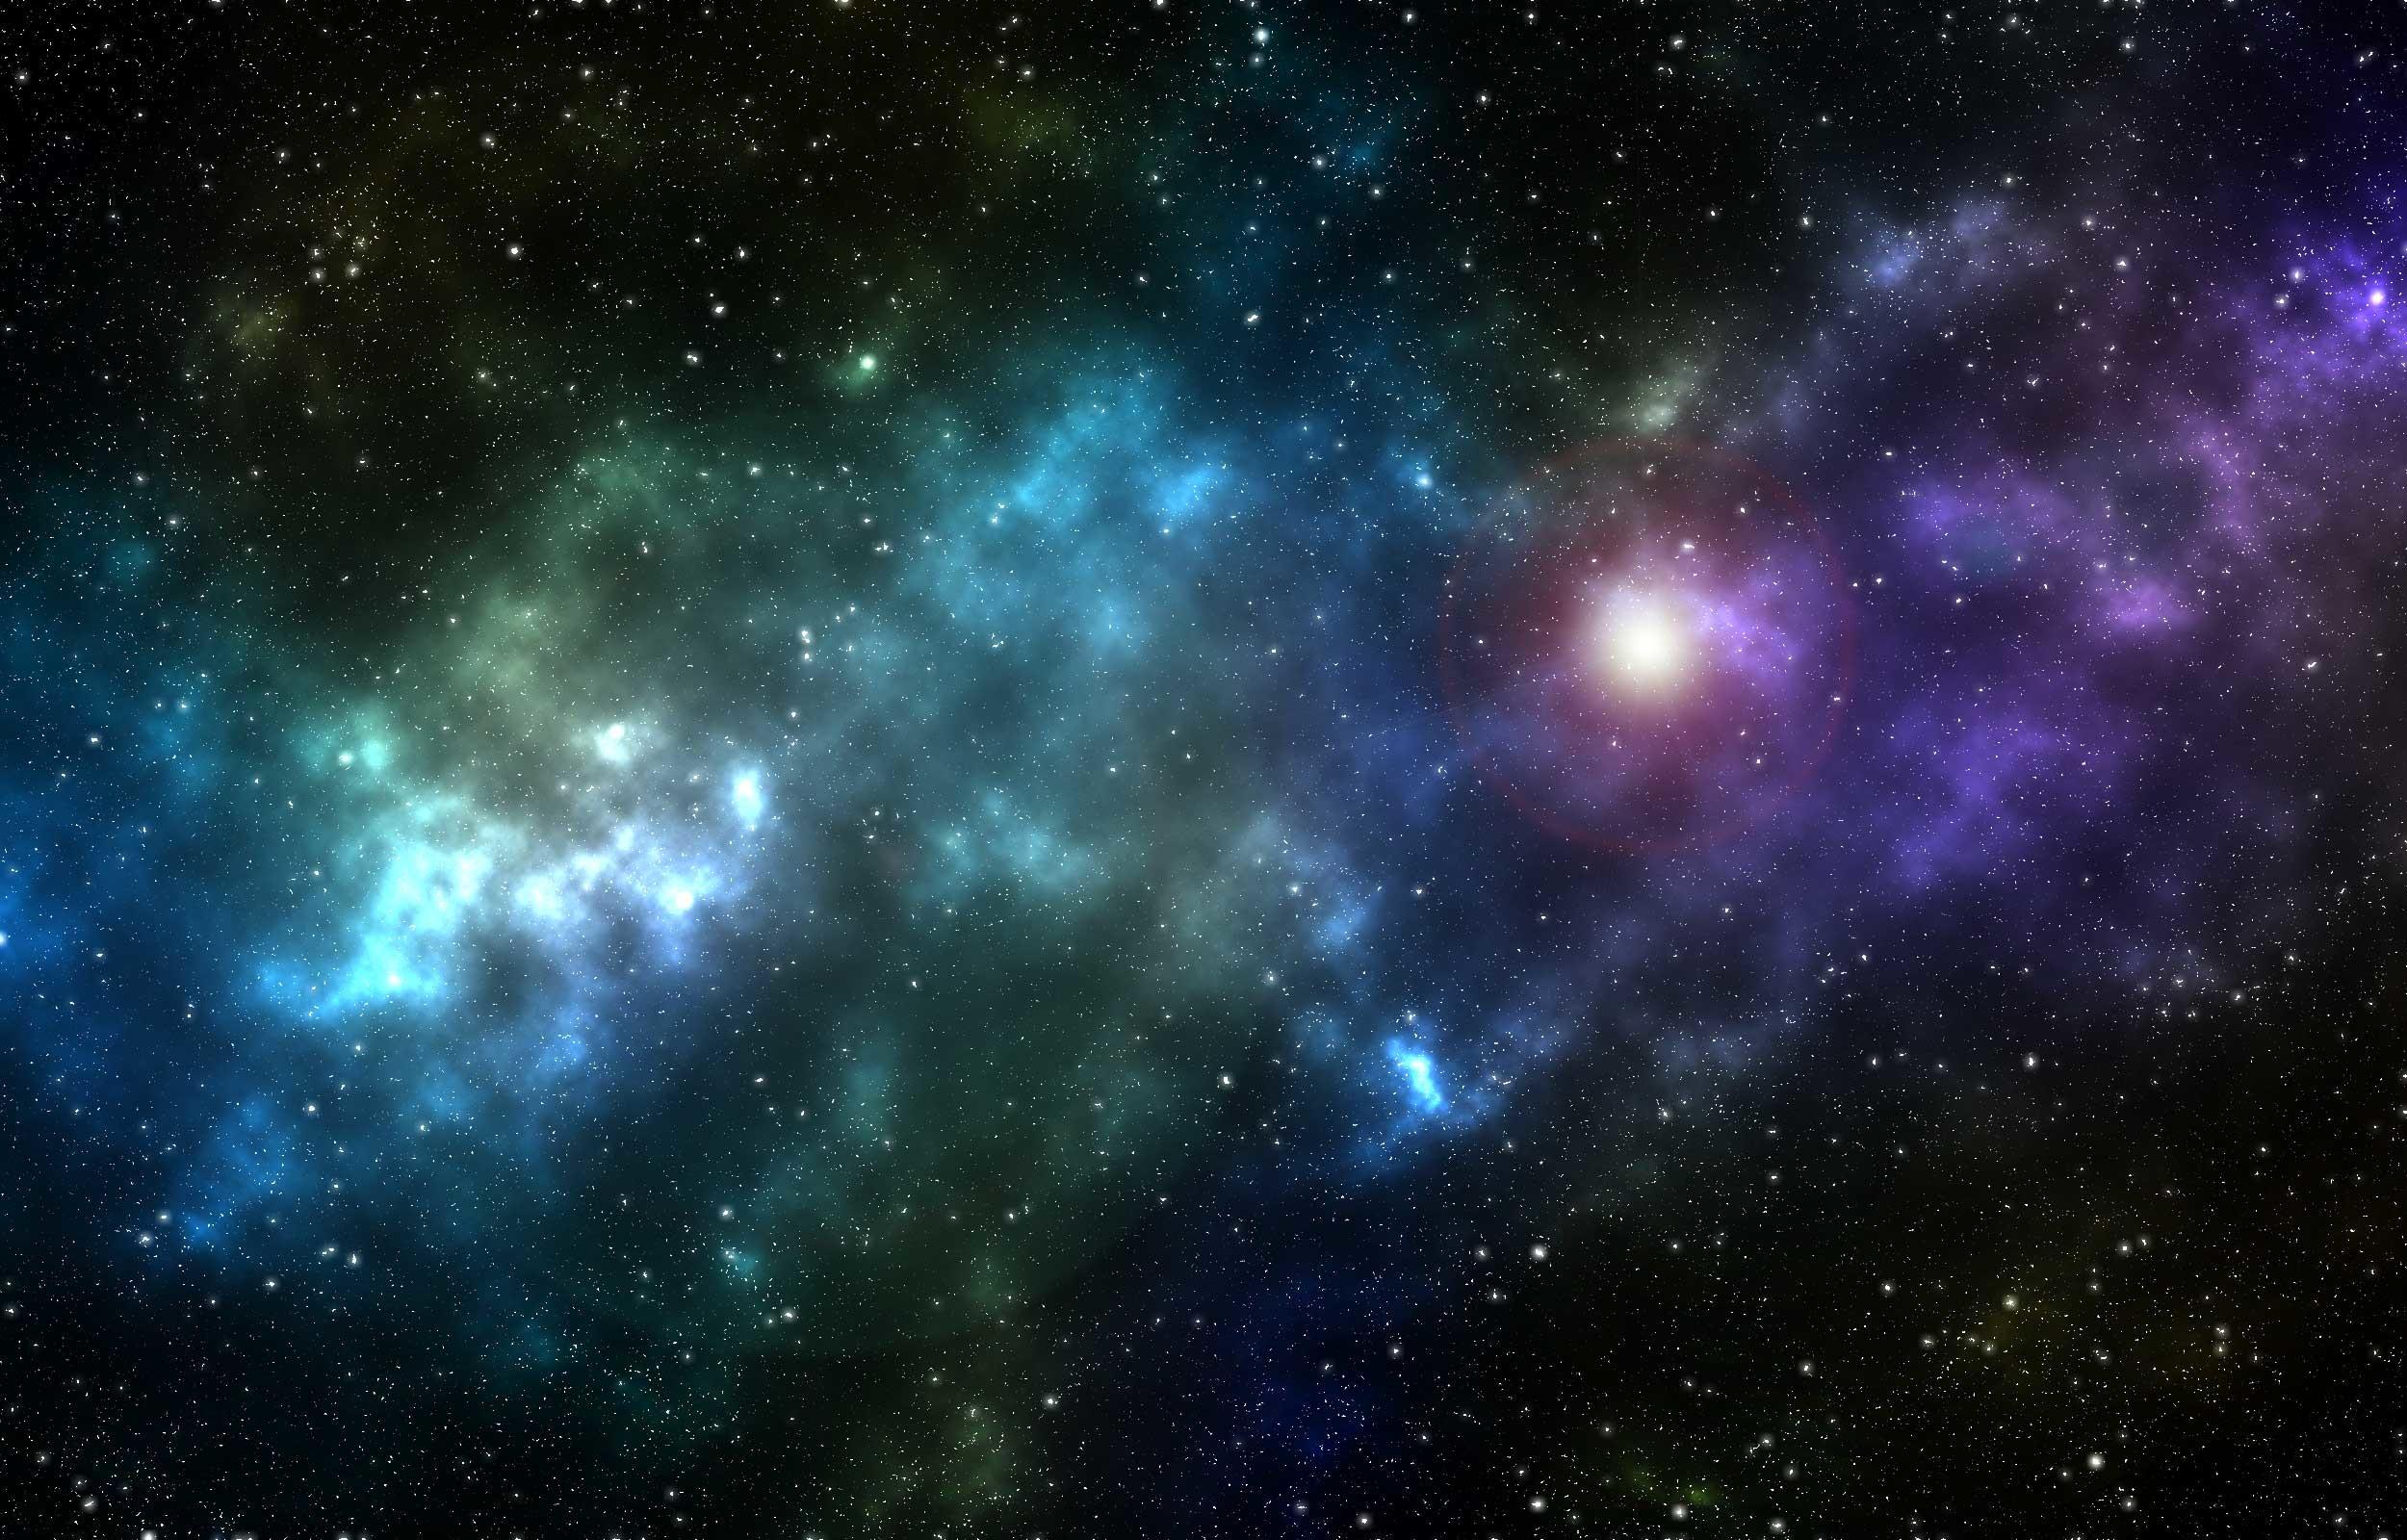 Create star field in Photoshop